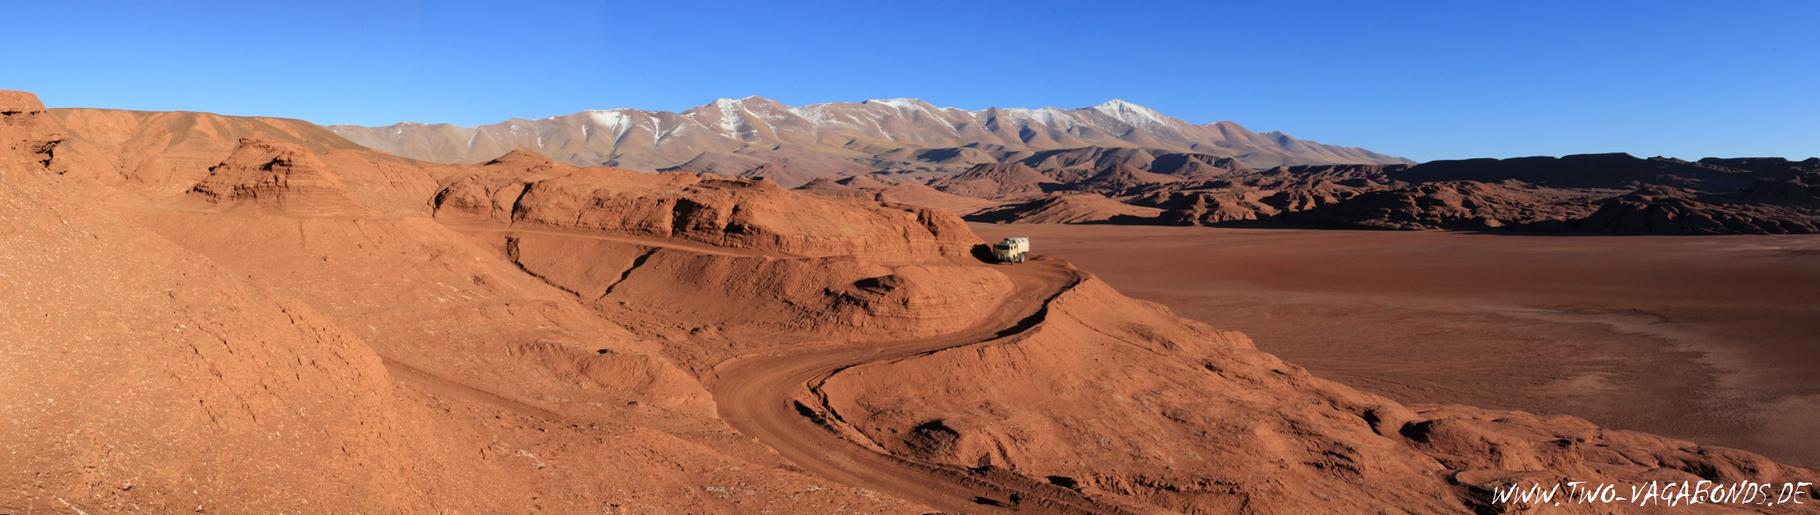 2015 ARGENTINIEN / TOLAR GRANDE